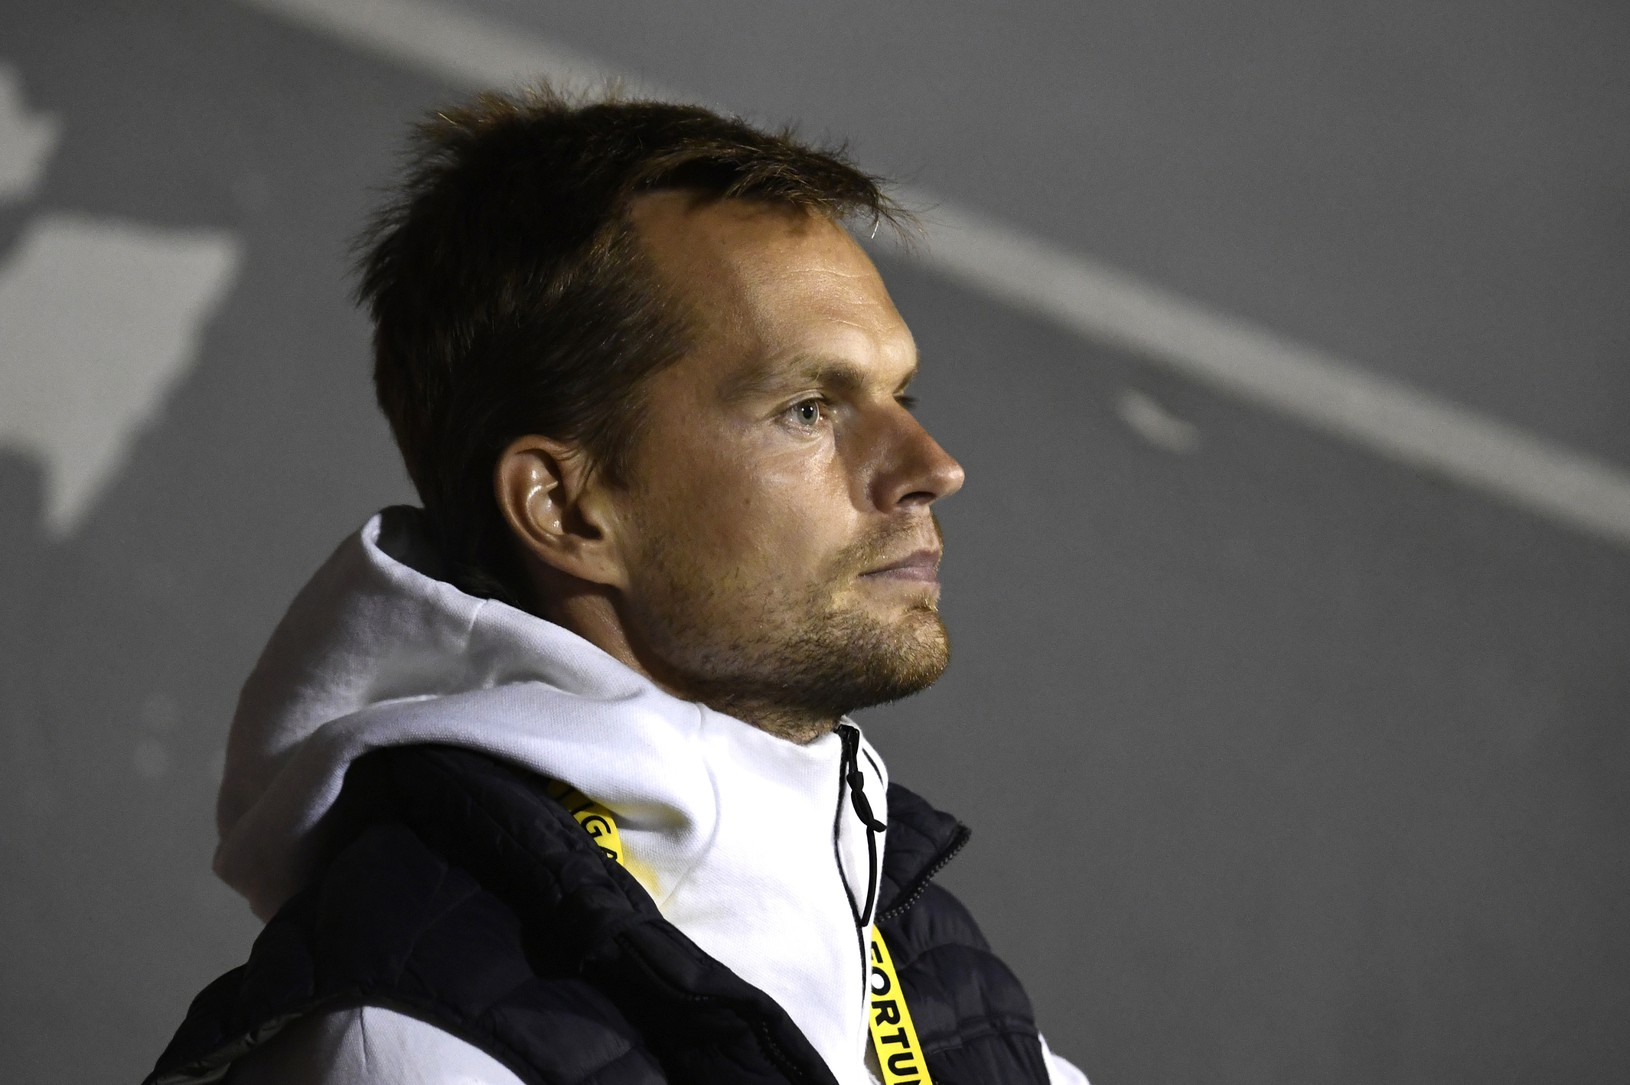 Tréner AS Trenčín Roman